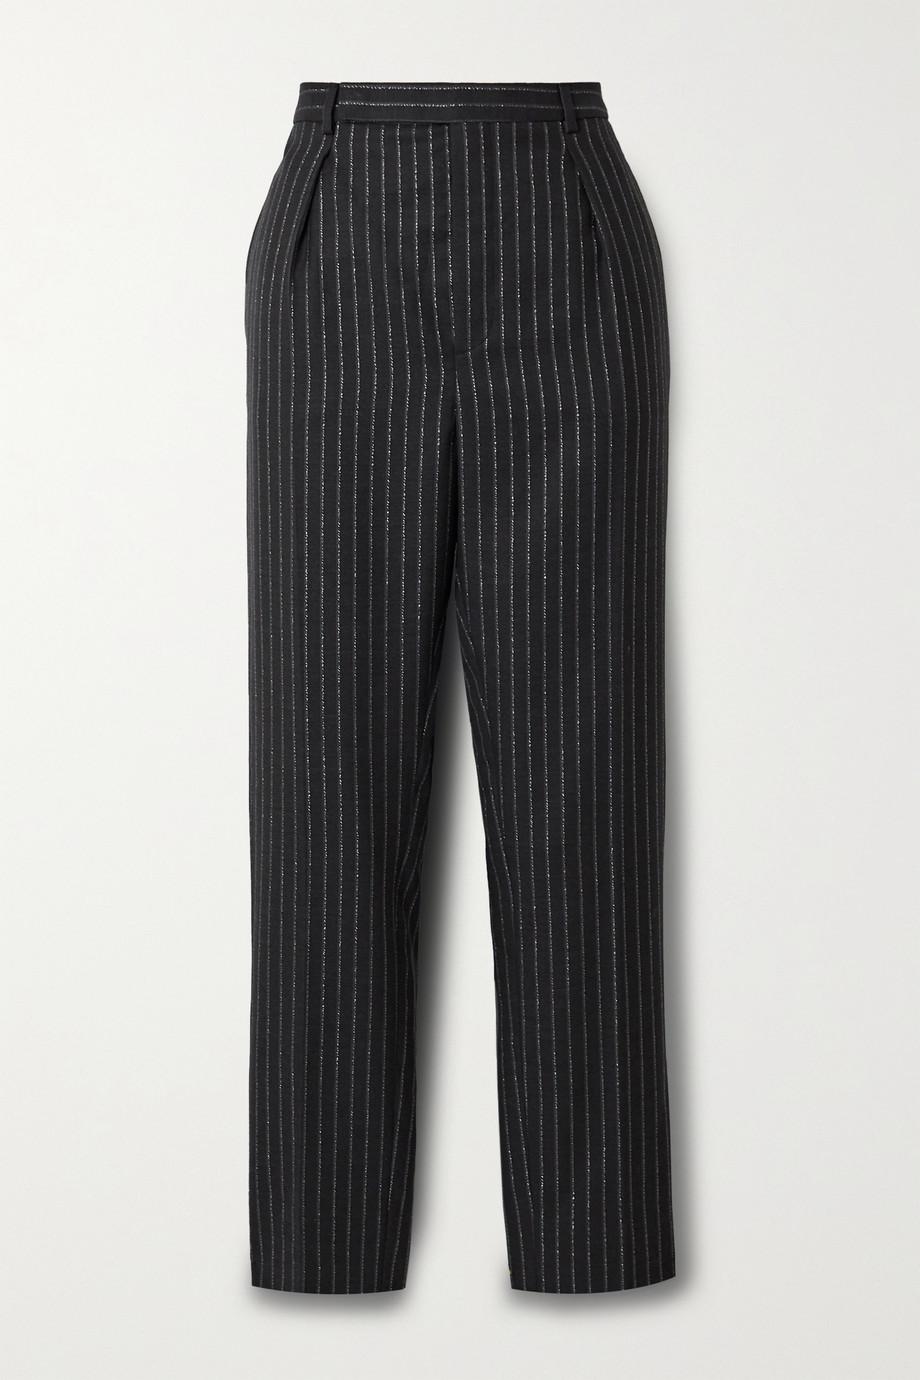 SAINT LAURENT Cropped metallic pinstriped wool-blend twill straight-leg pants